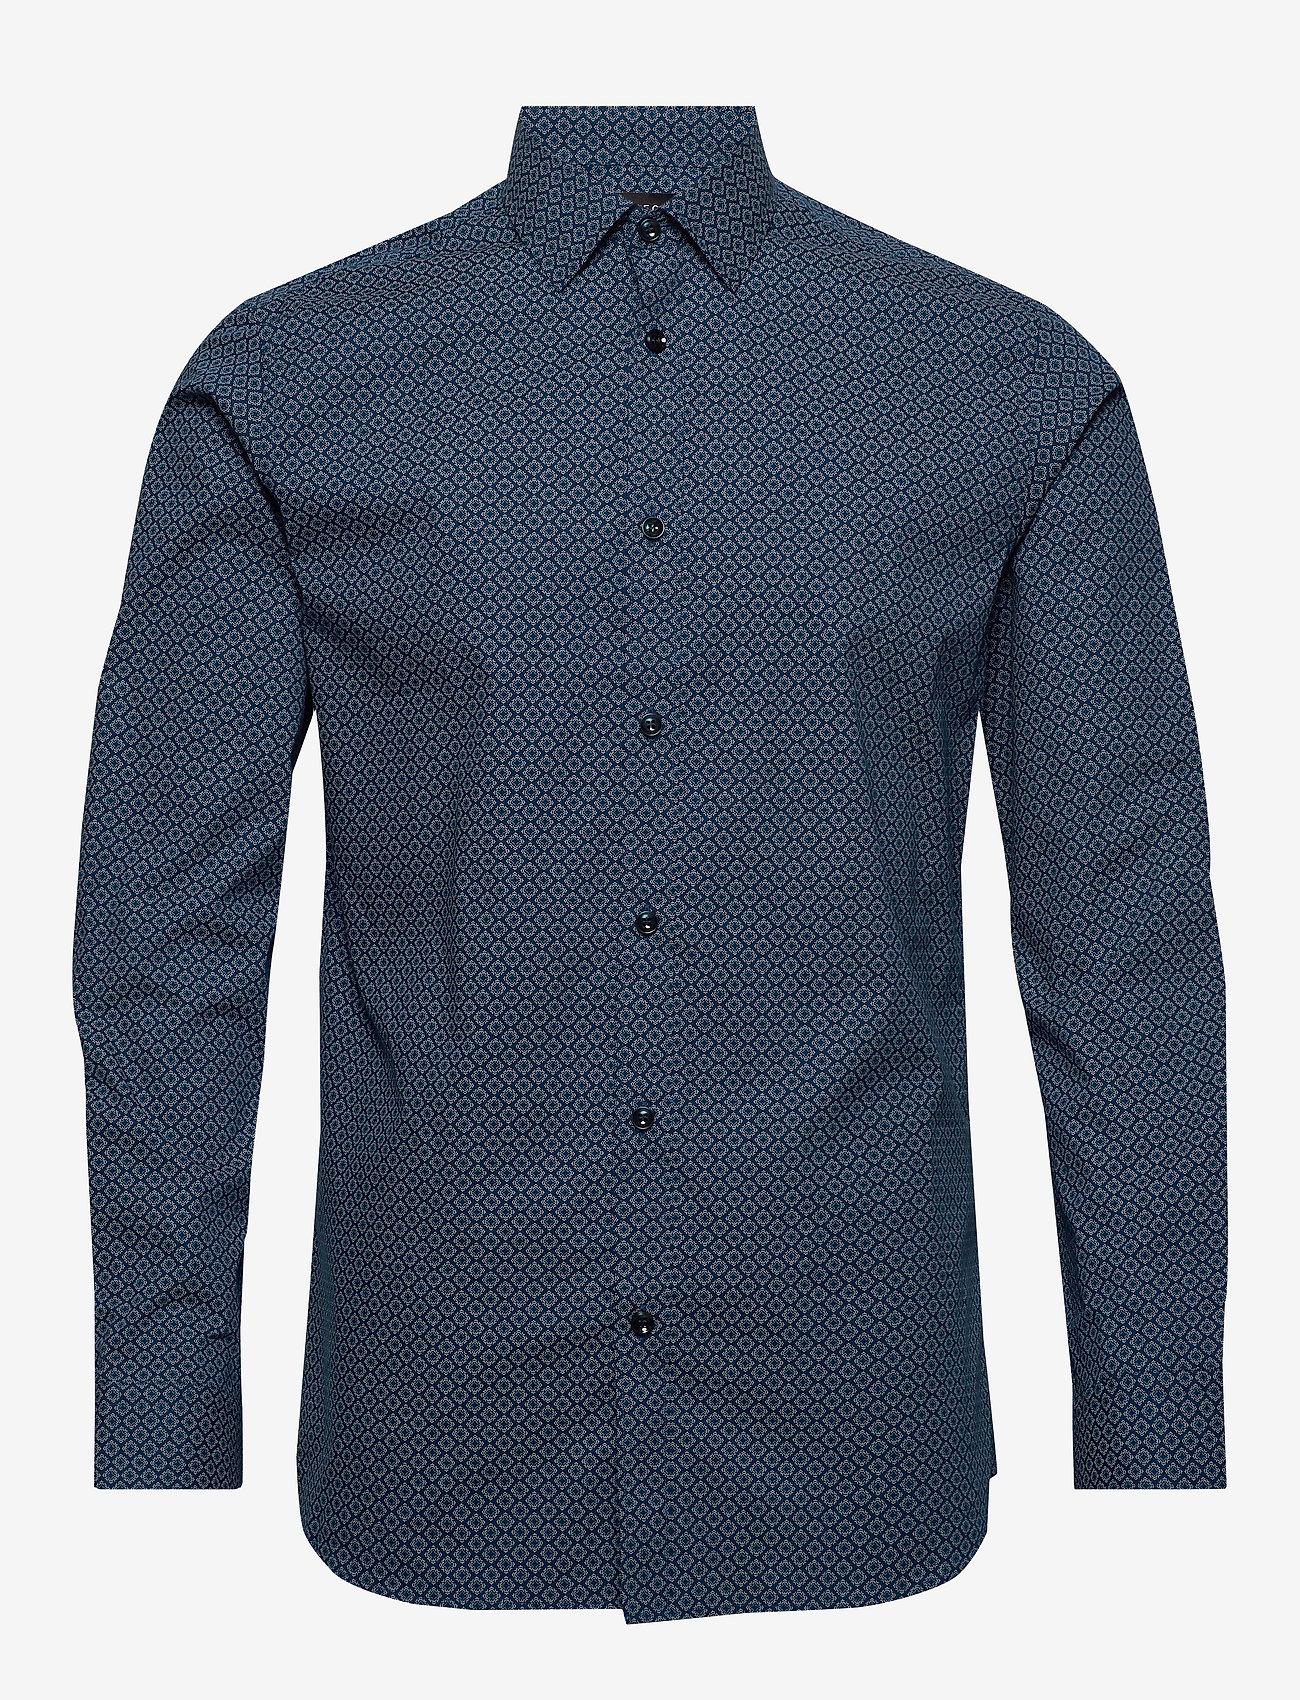 Selected Homme - SLHREGPEN-HARPER SHIRT LS B NOOS - chemises business - dark navy